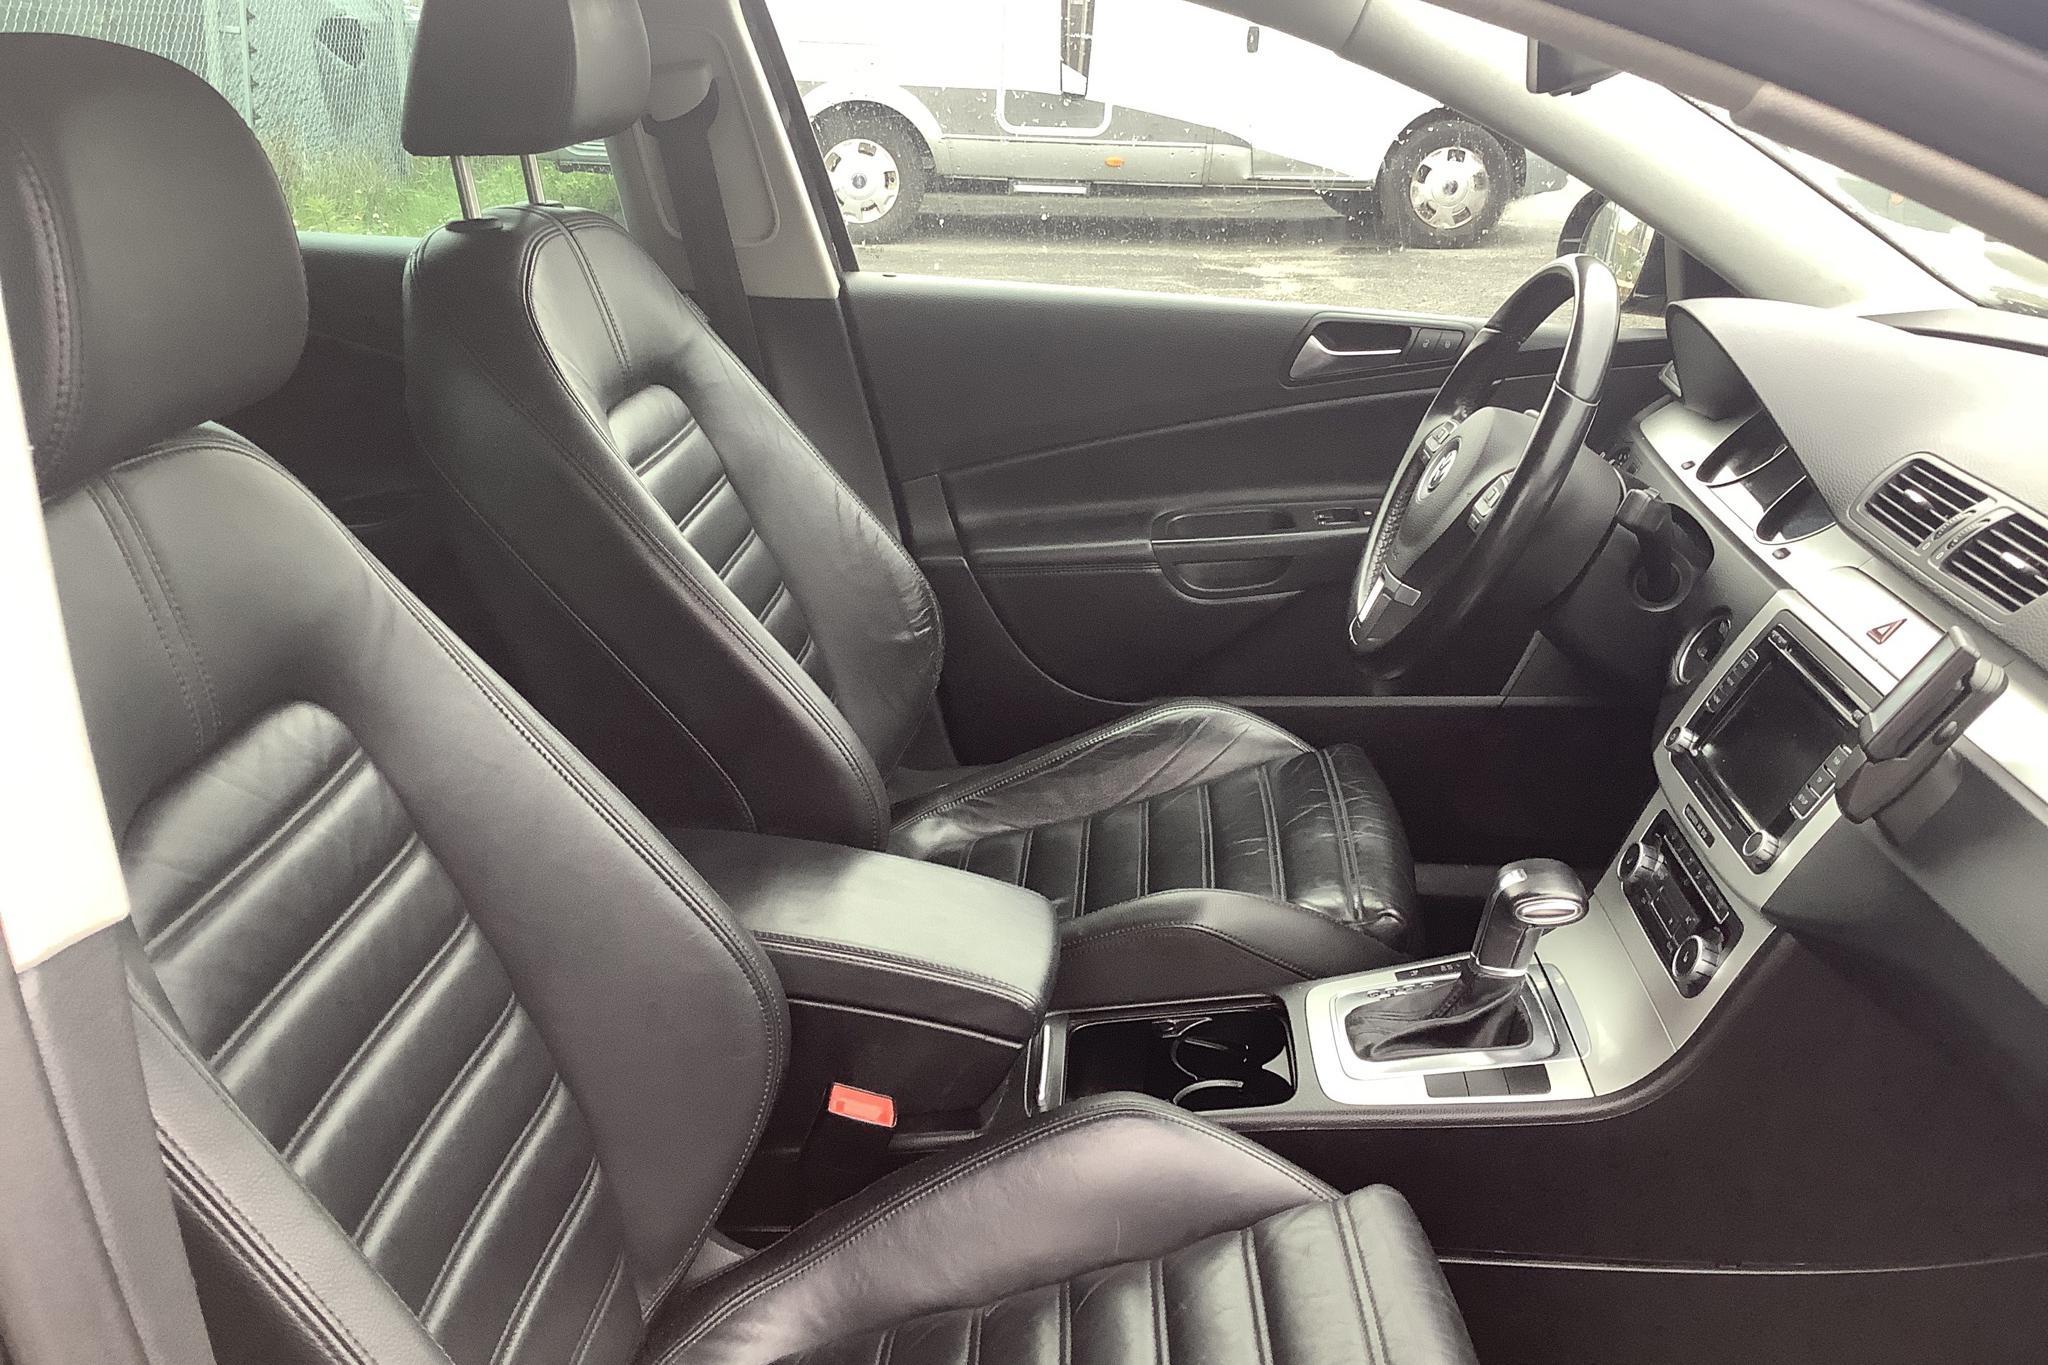 VW Passat 1.4 TSI EcoFuel Variant (150hk) - 16 044 mil - Automat - svart - 2010